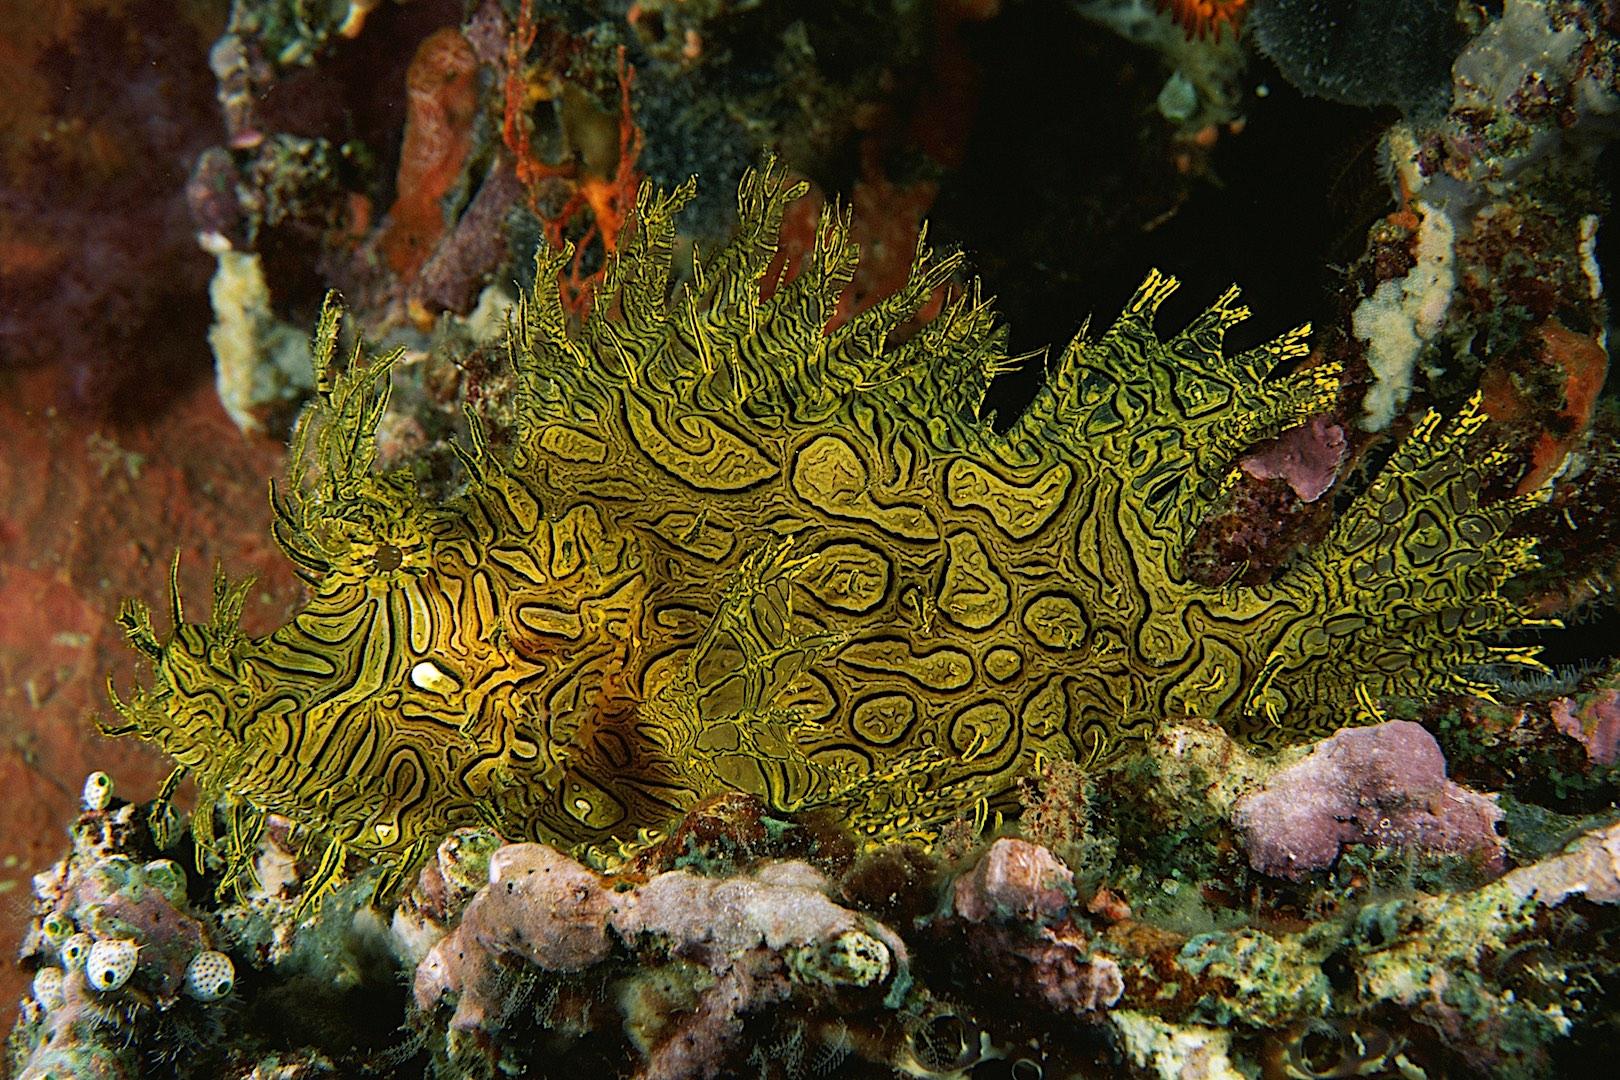 Lacy Scorpionfish (Rhinopias)